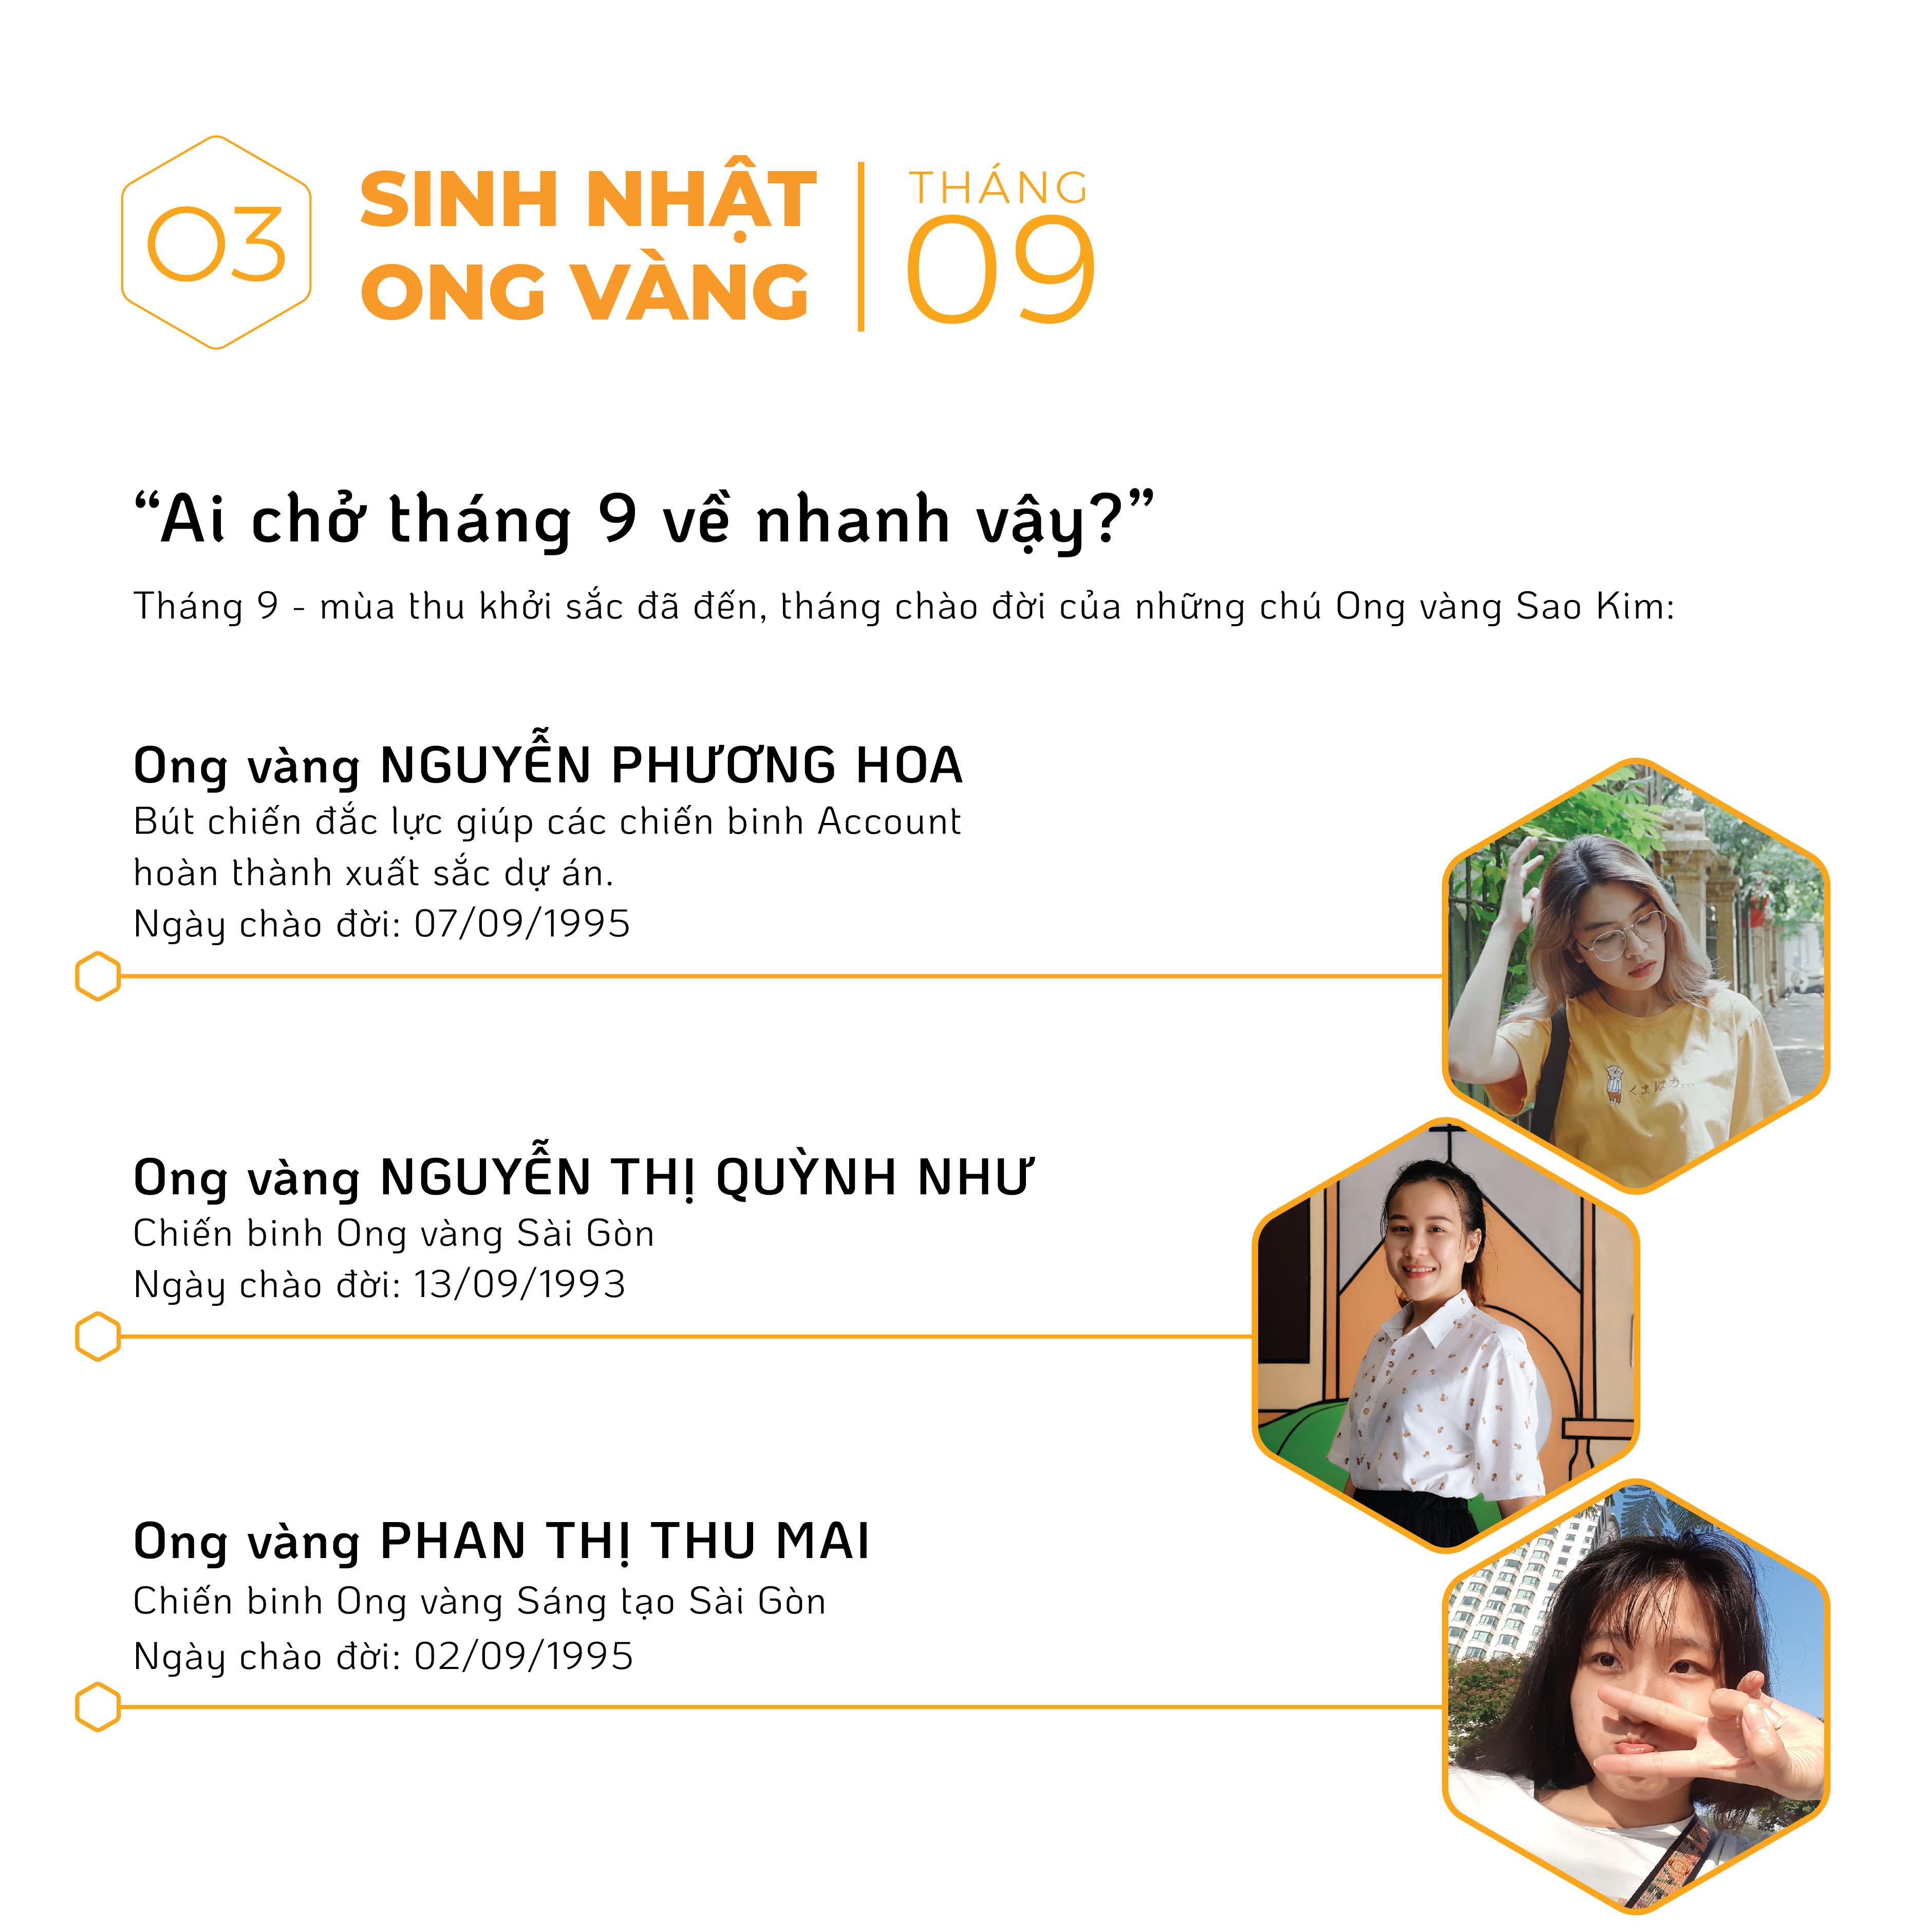 ban-tin-to-ong-04-1.jpg